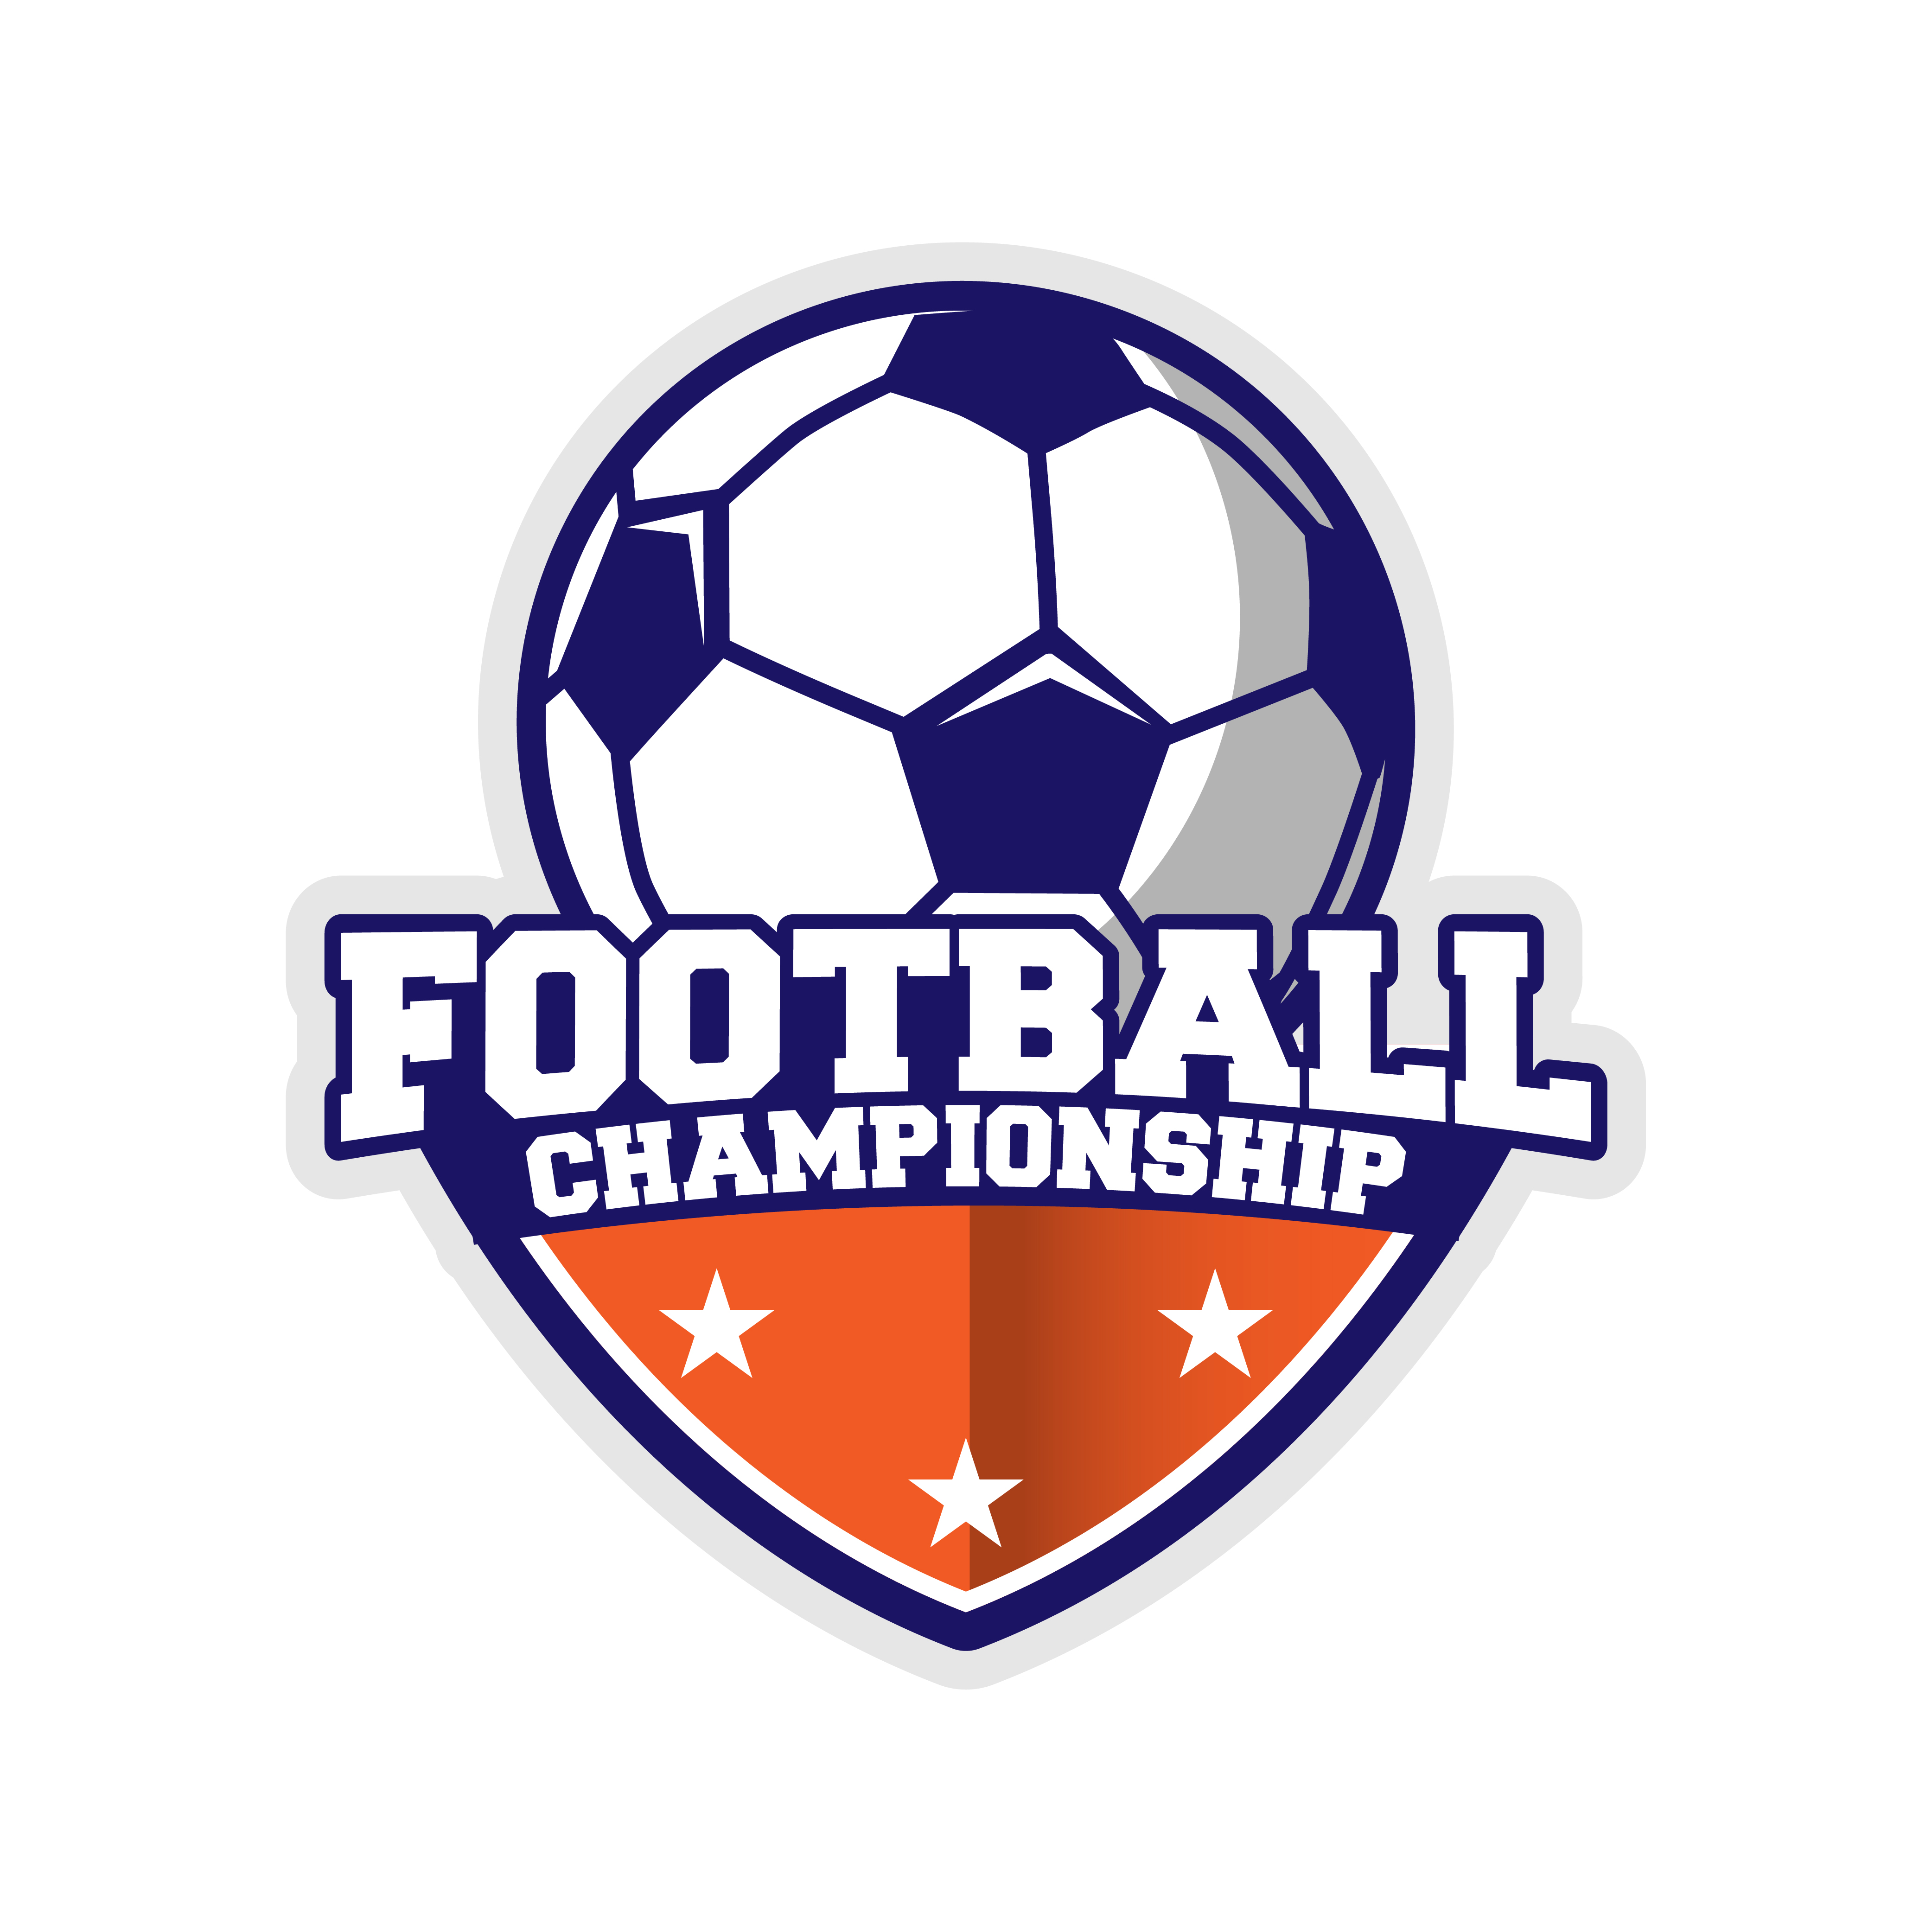 1082 footbal championship logo 07